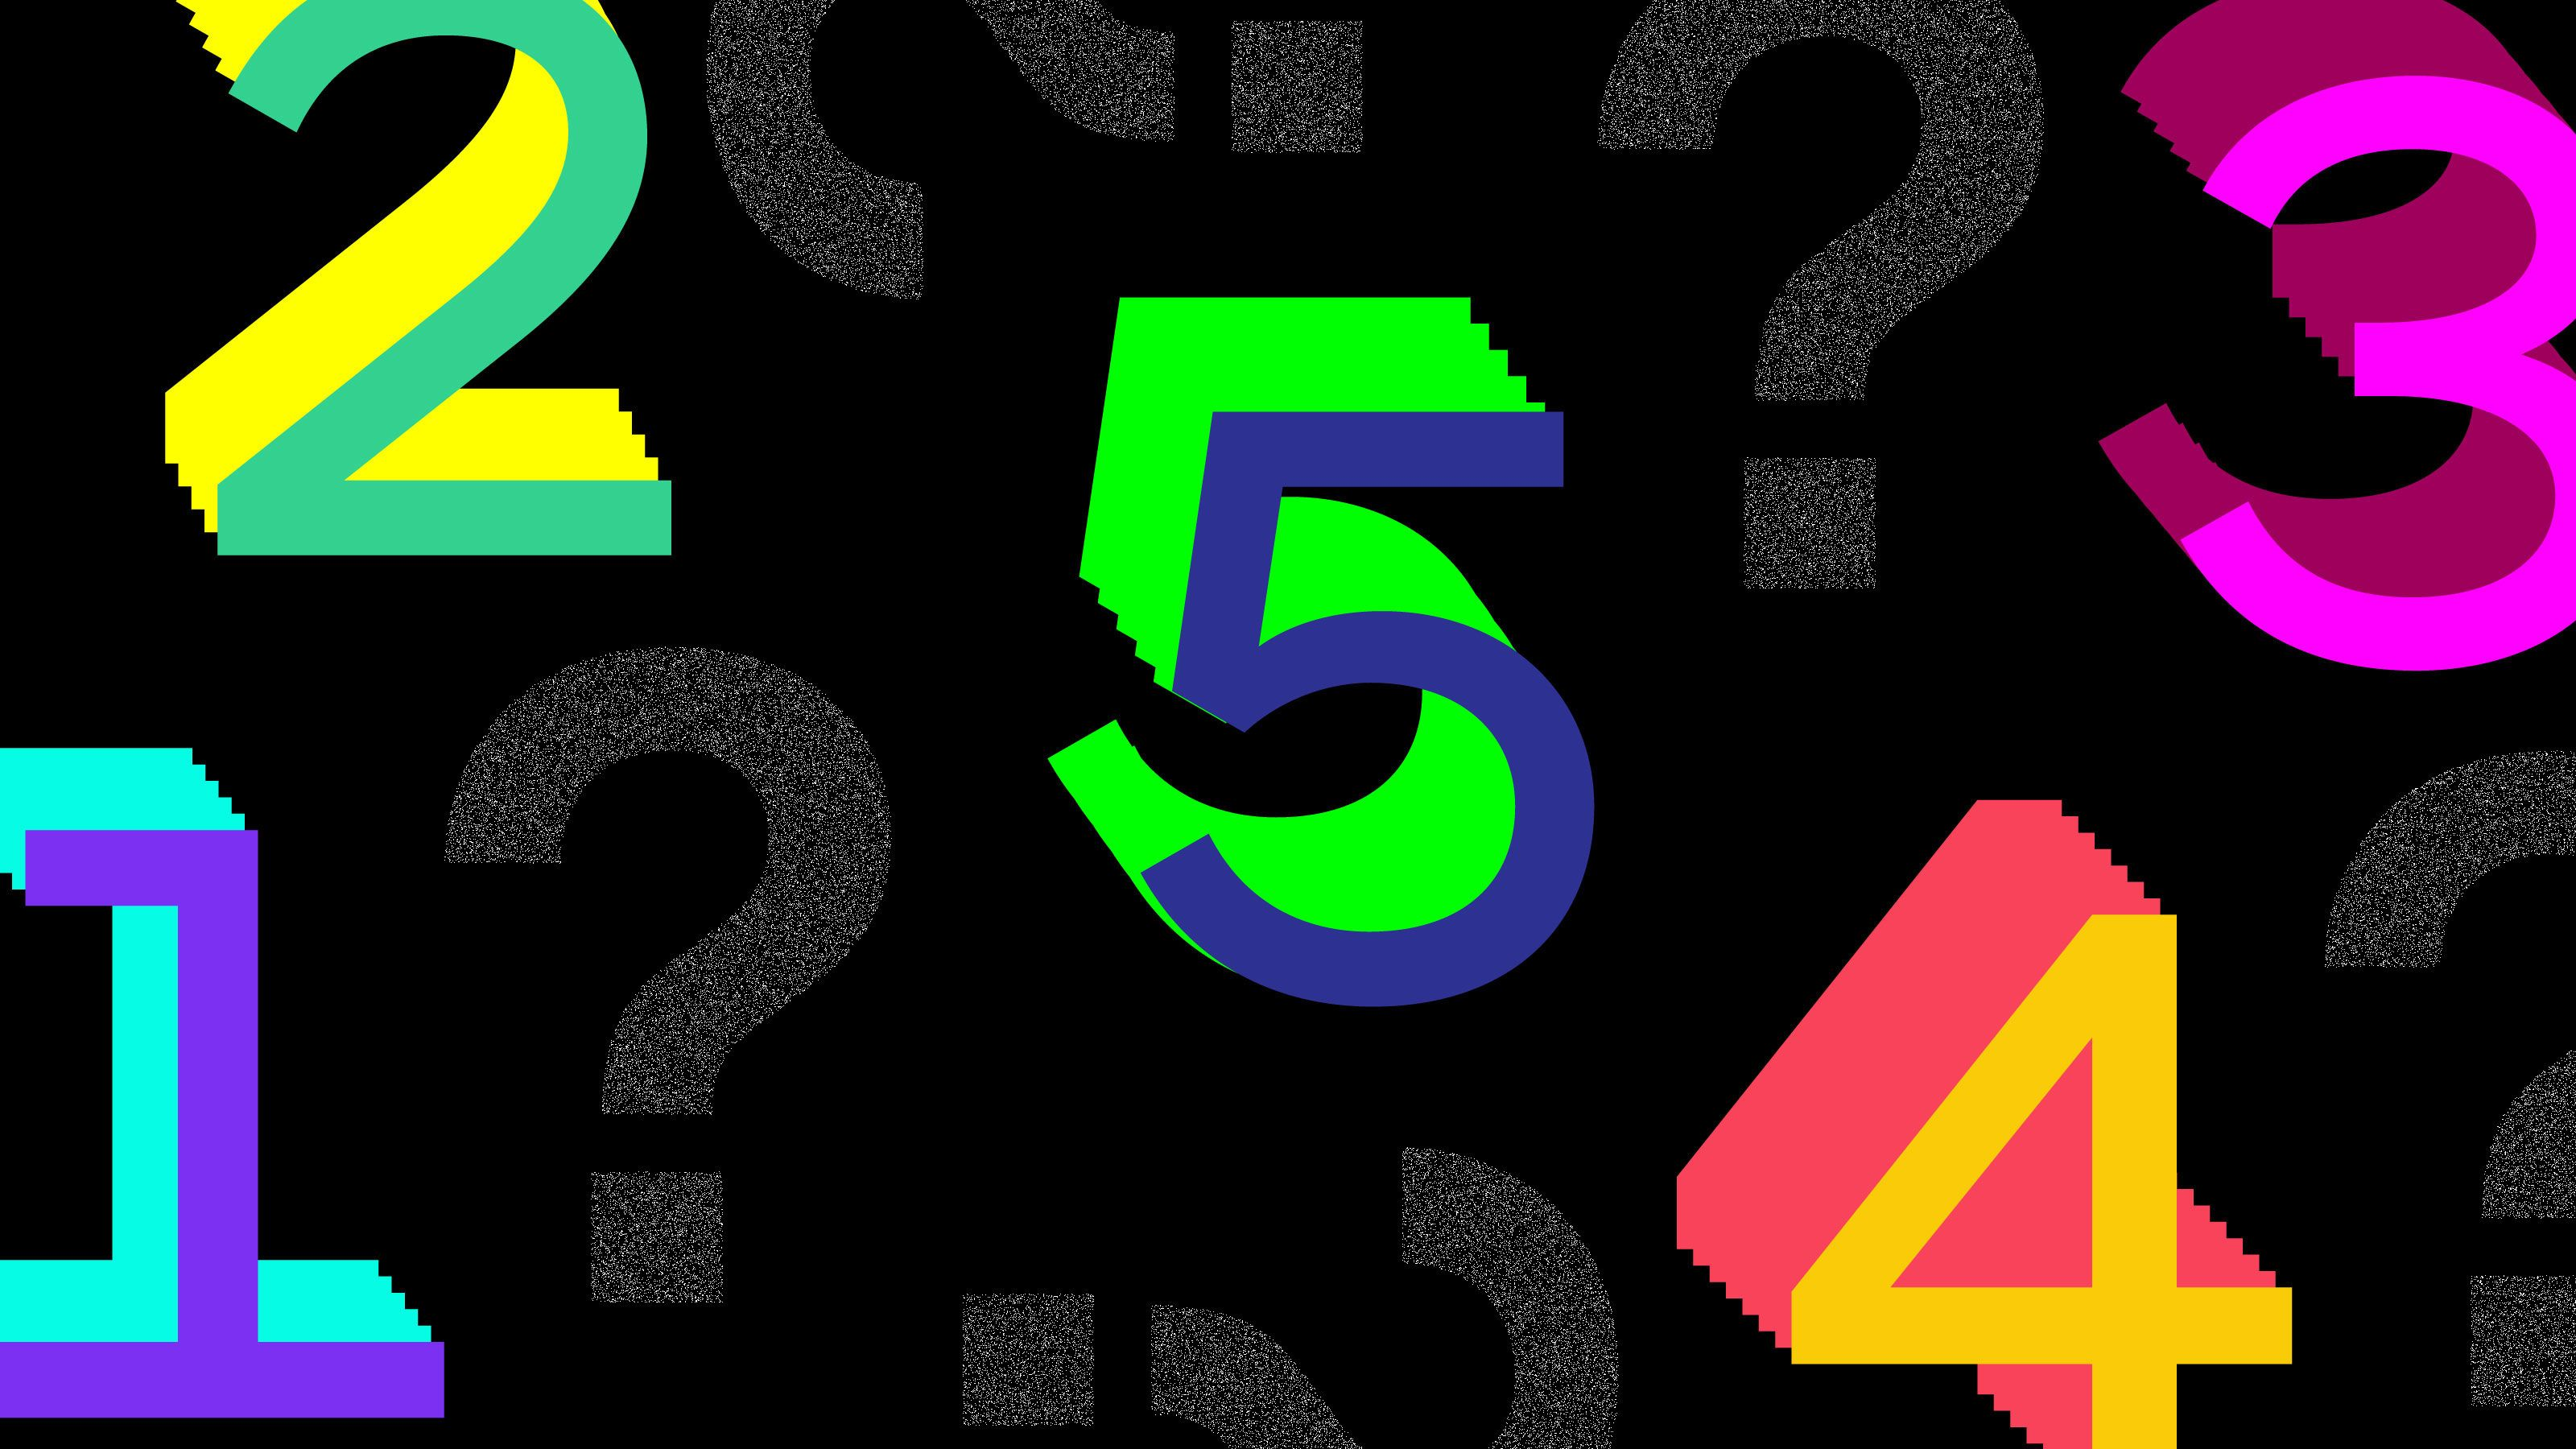 MITTR担当記者が教える、AIベンダーを見抜く「5つの質問」